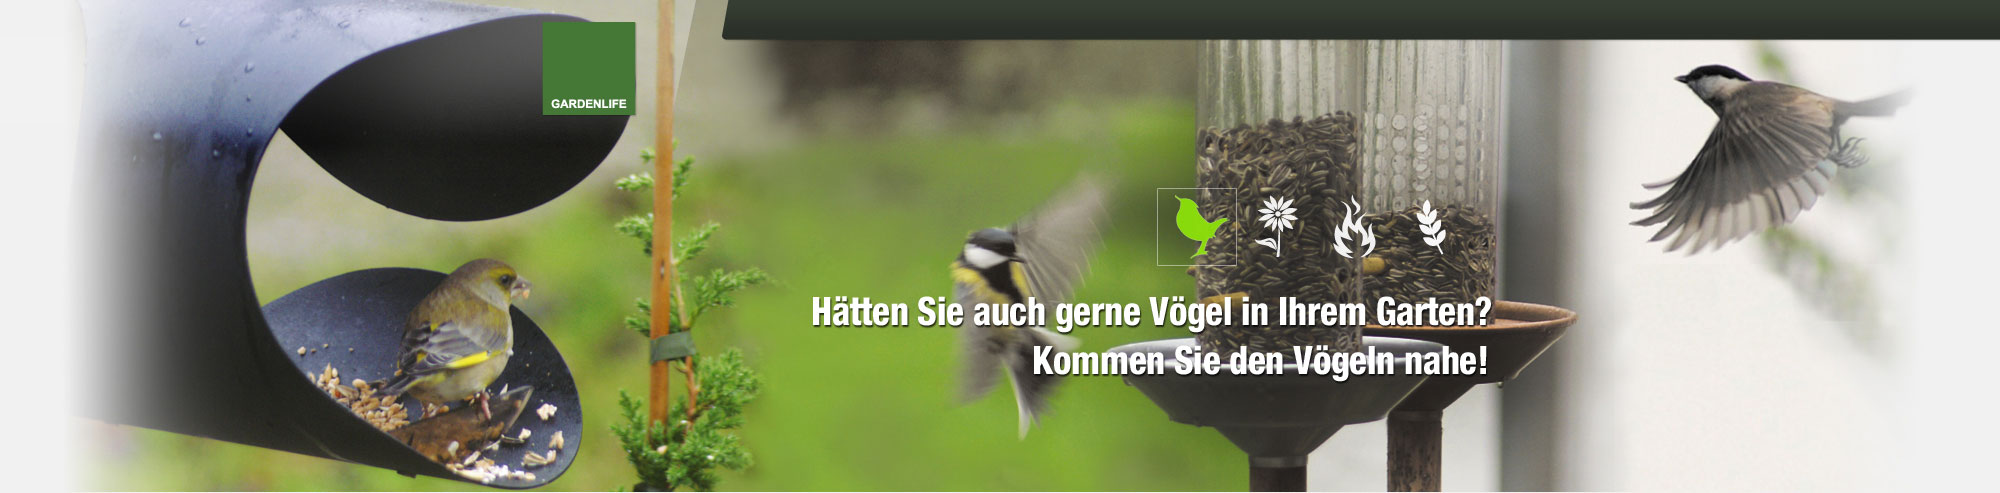 Garden Life Bird Online Shop, Bild 1